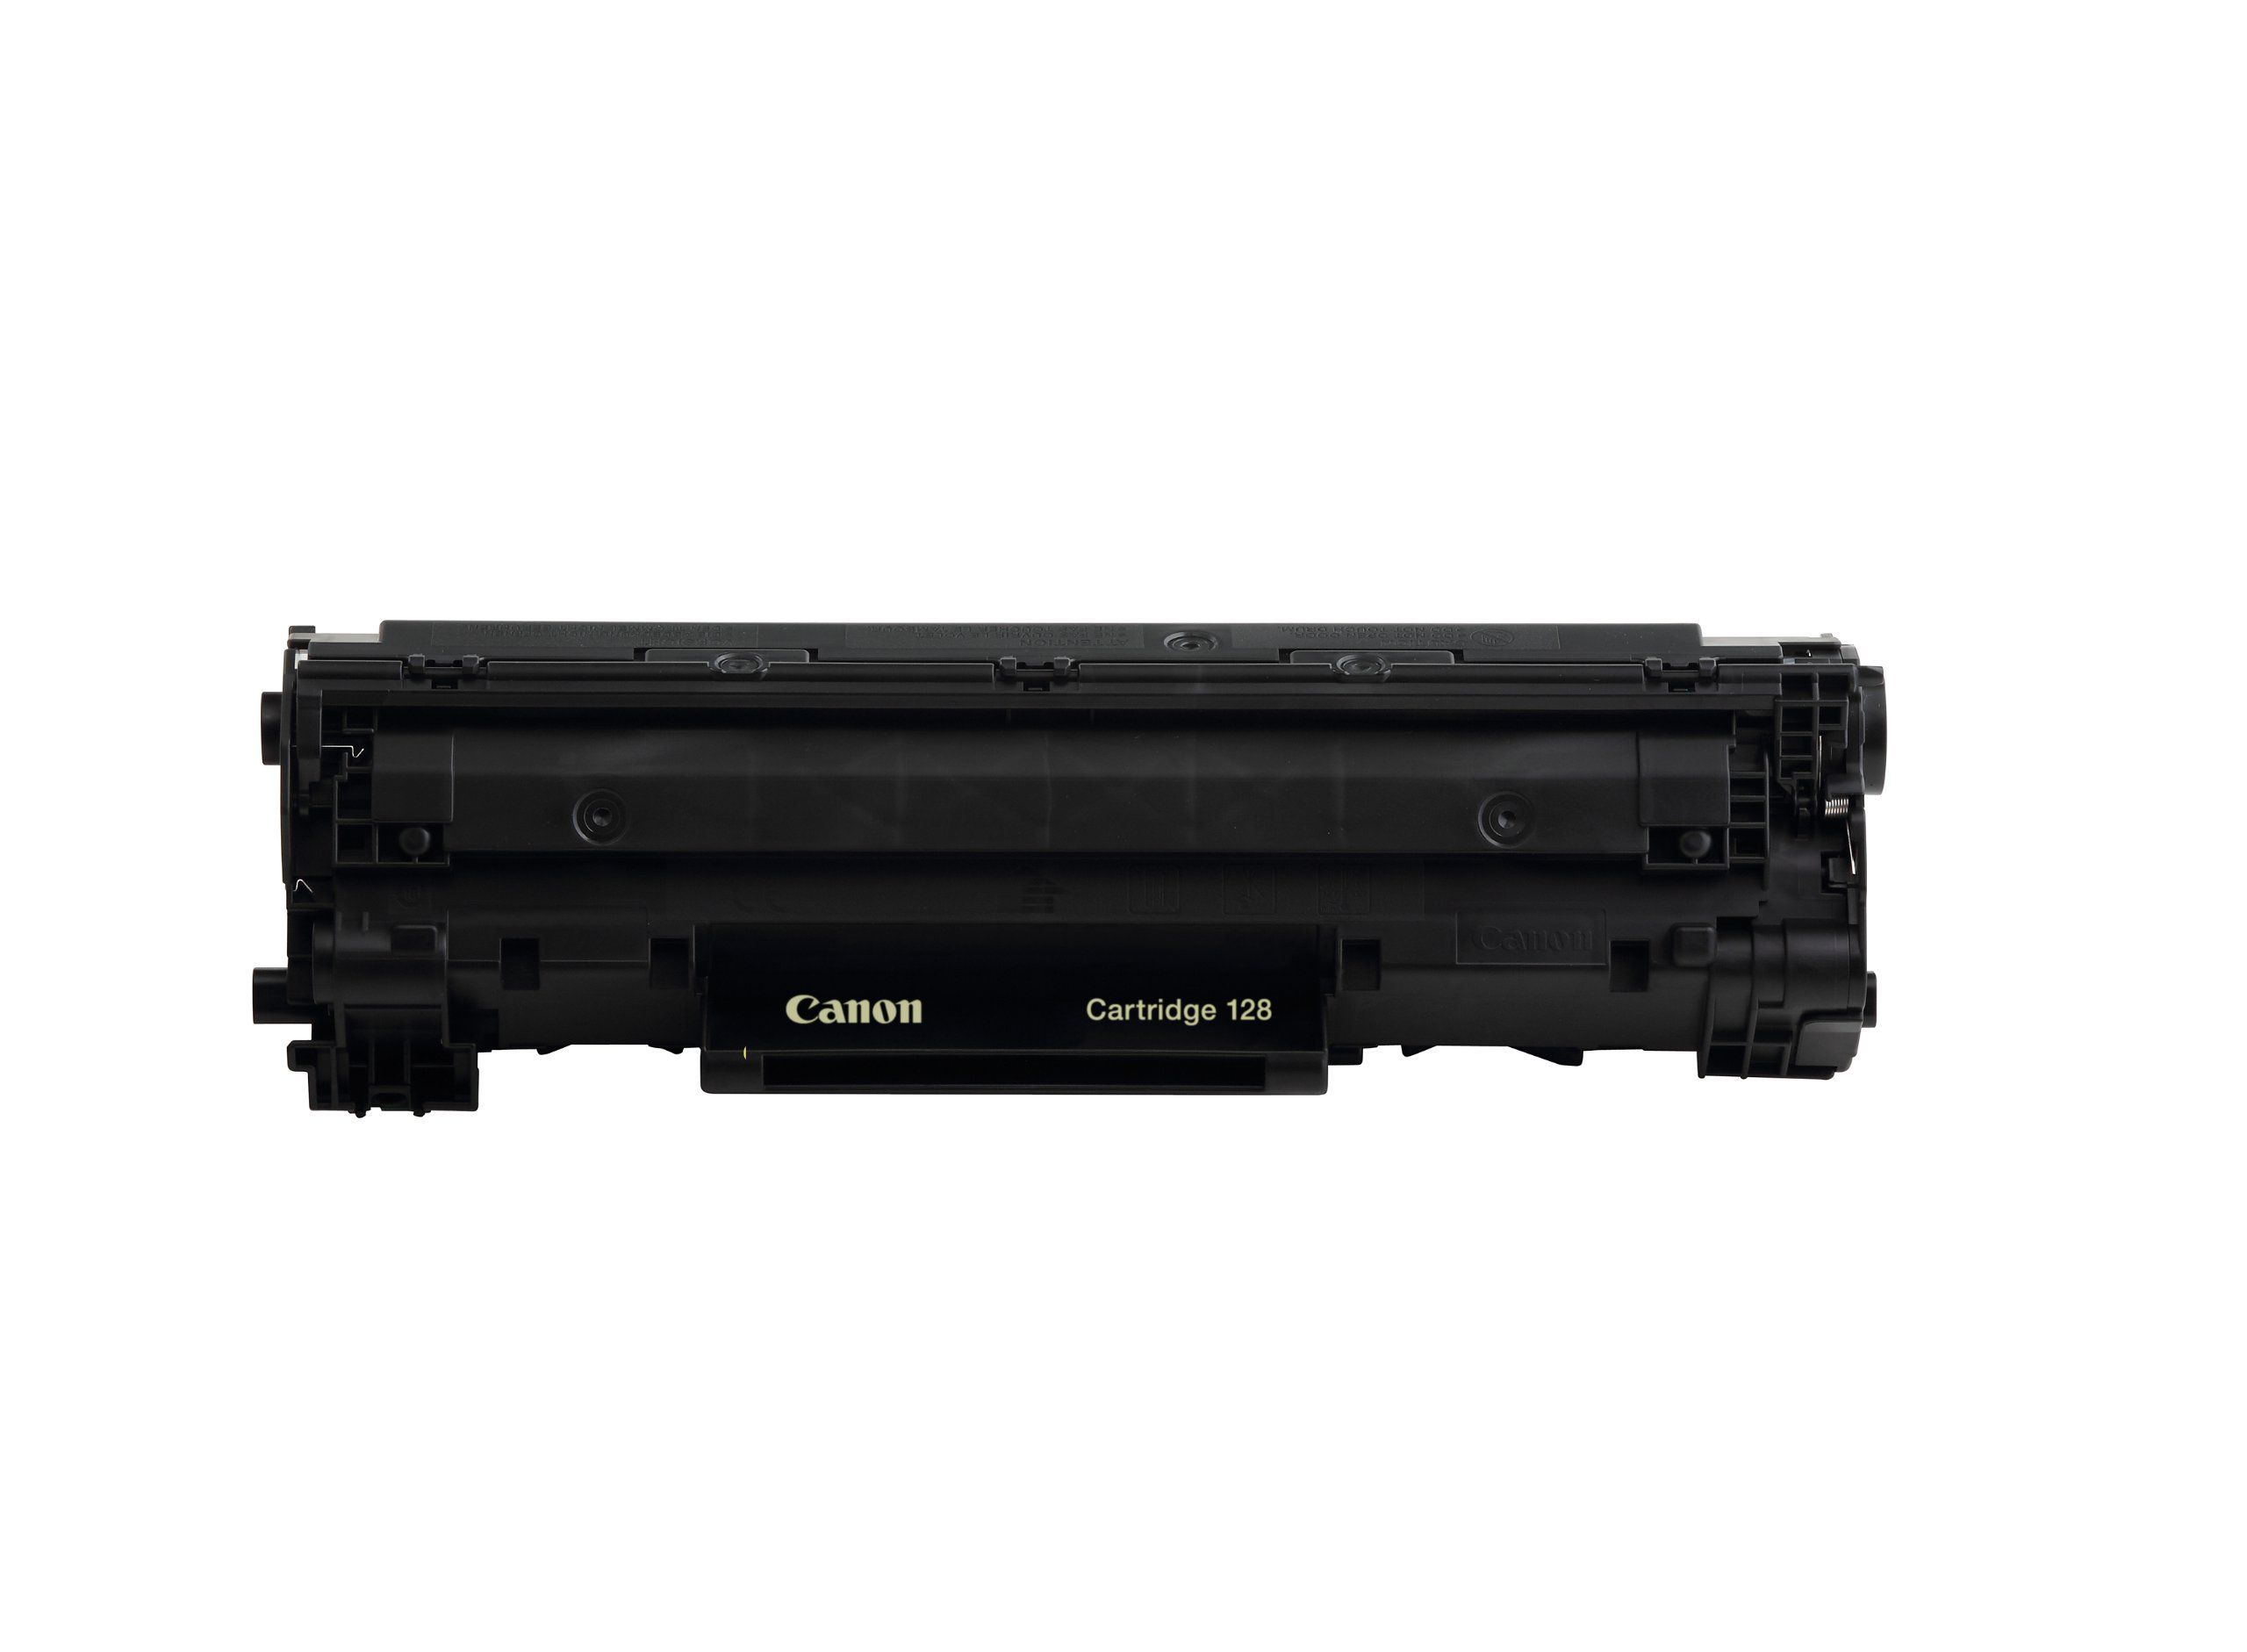 Canon Original 128 Toner Cartridge Black 3500b001aa Toner